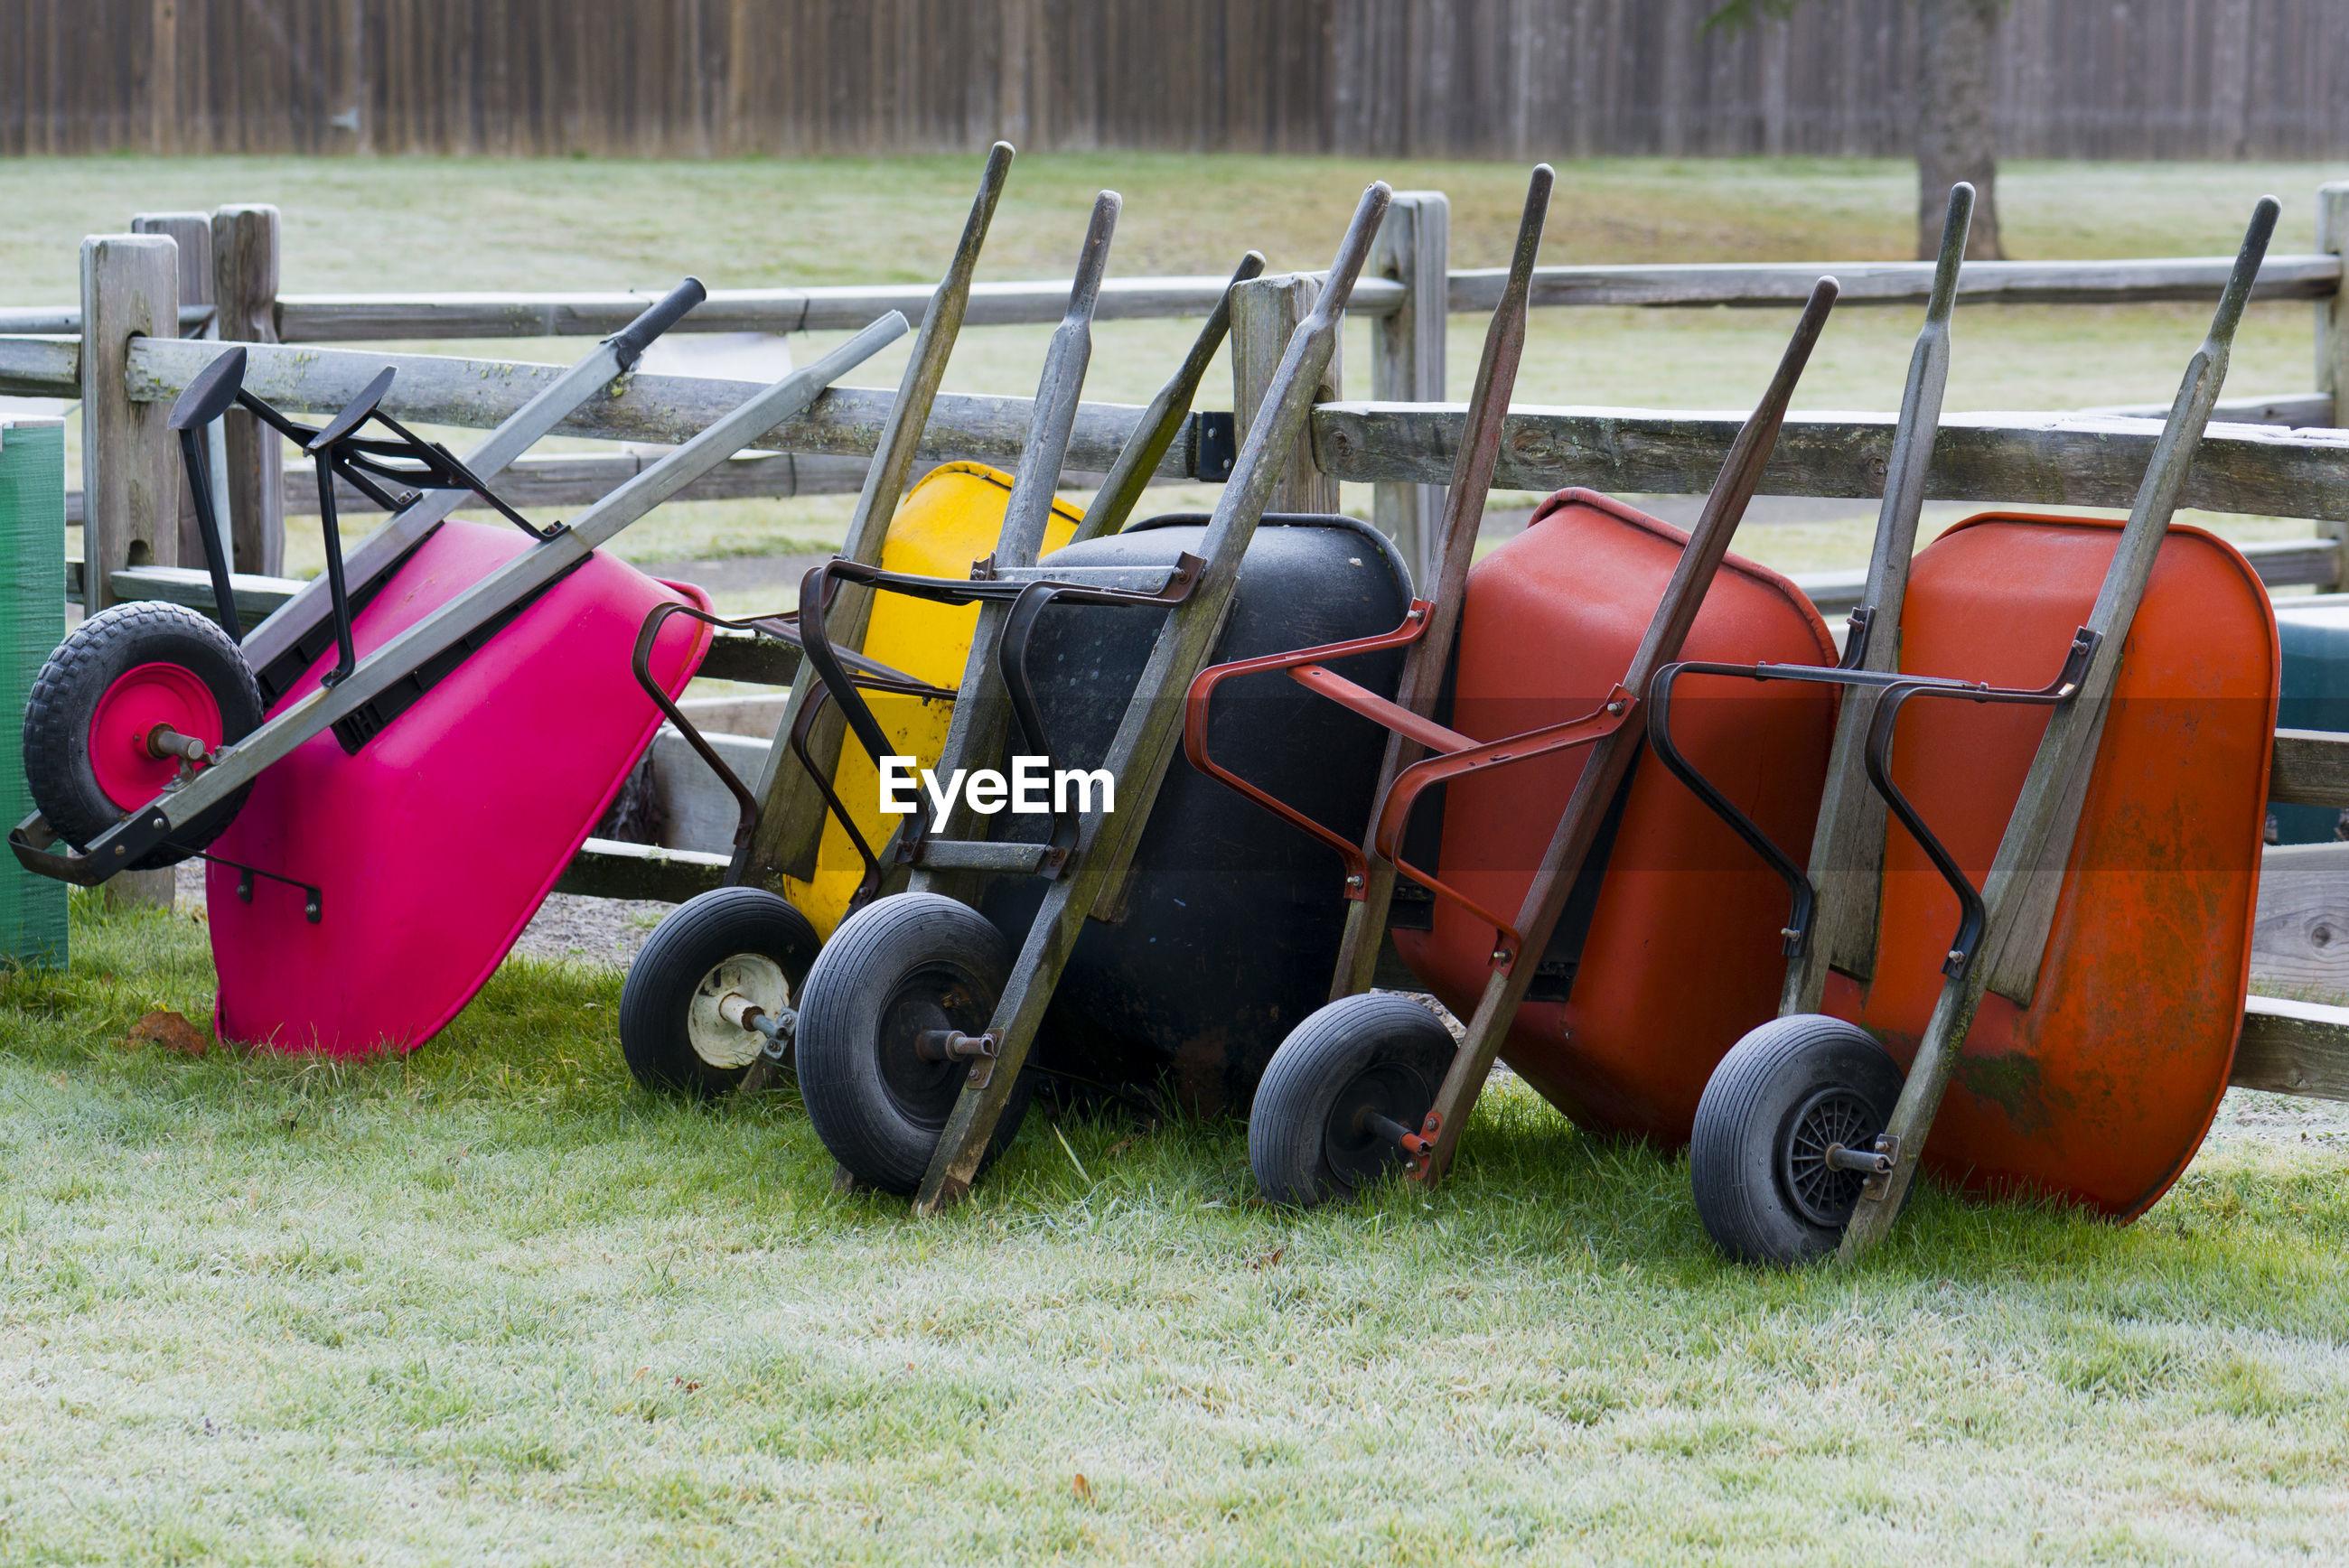 Colorful wheelbarrows on grassy field